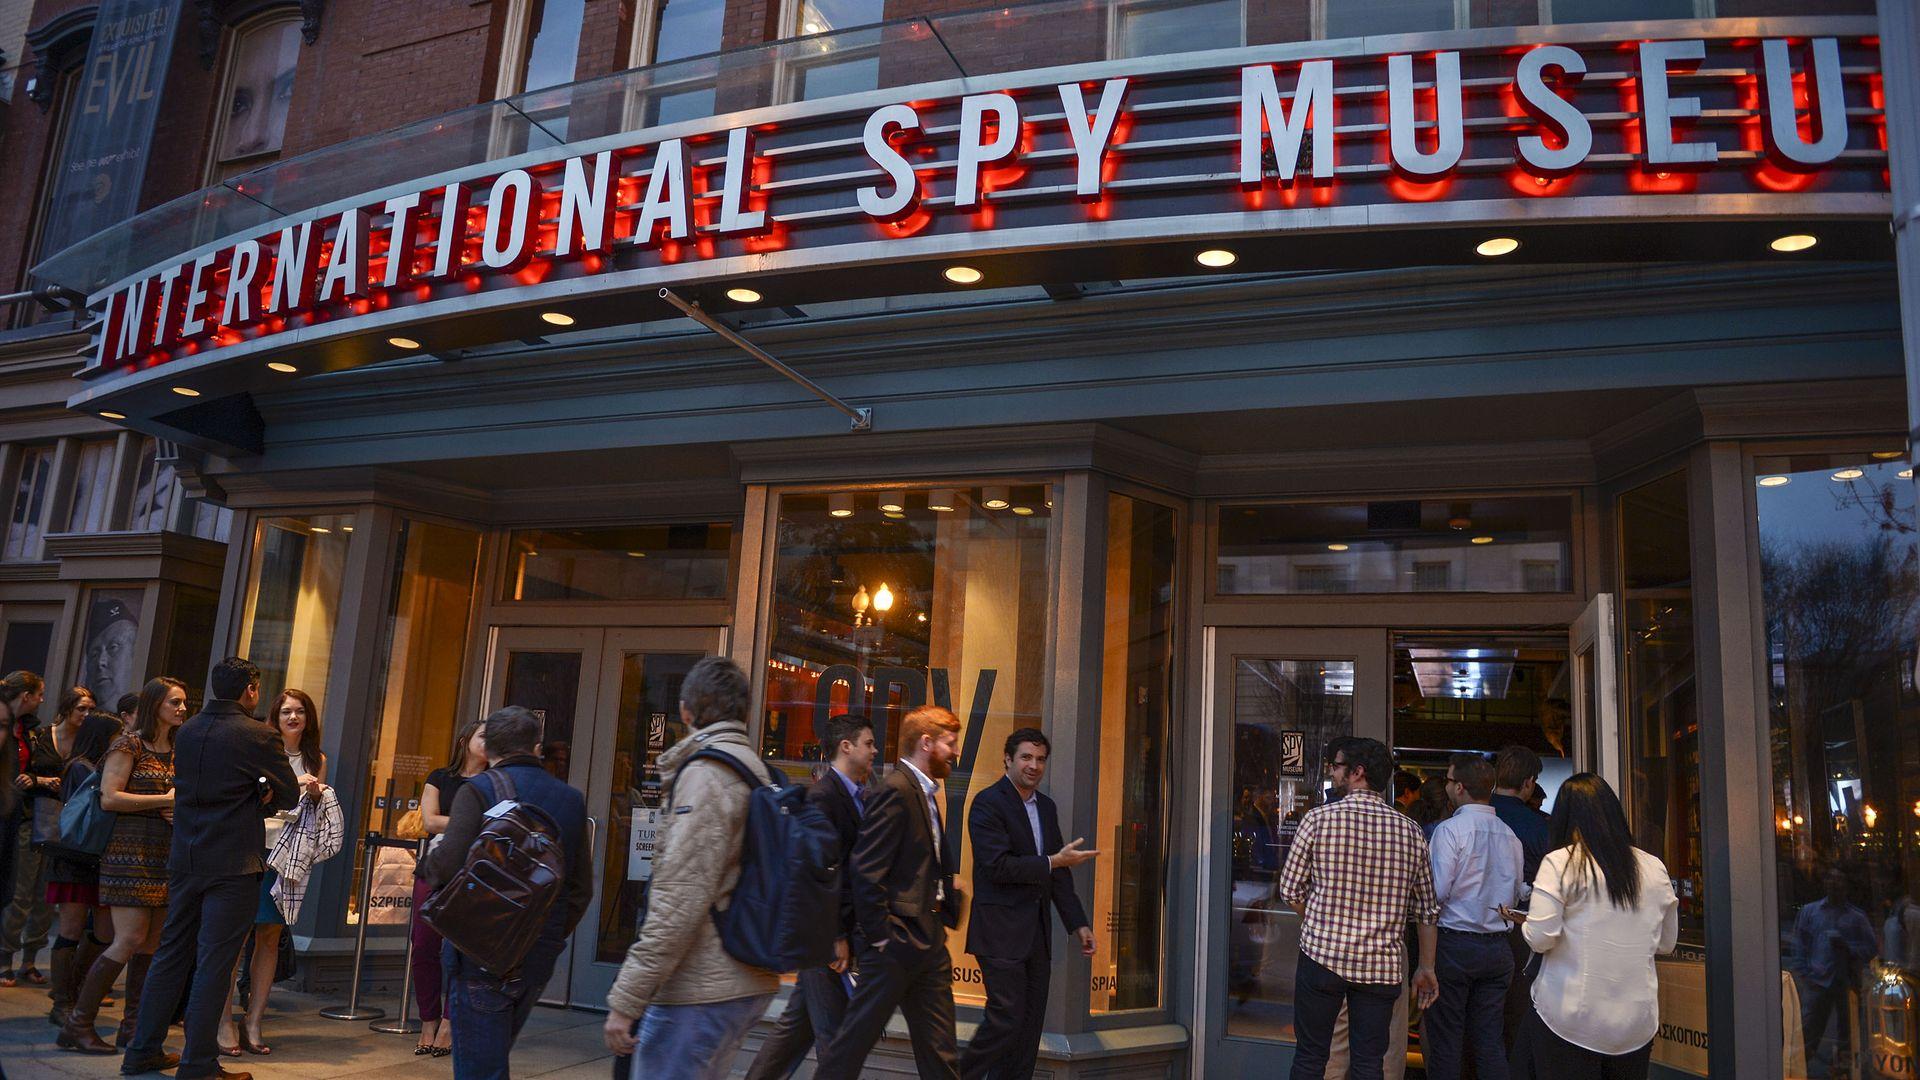 The International Spy Museum entrance.